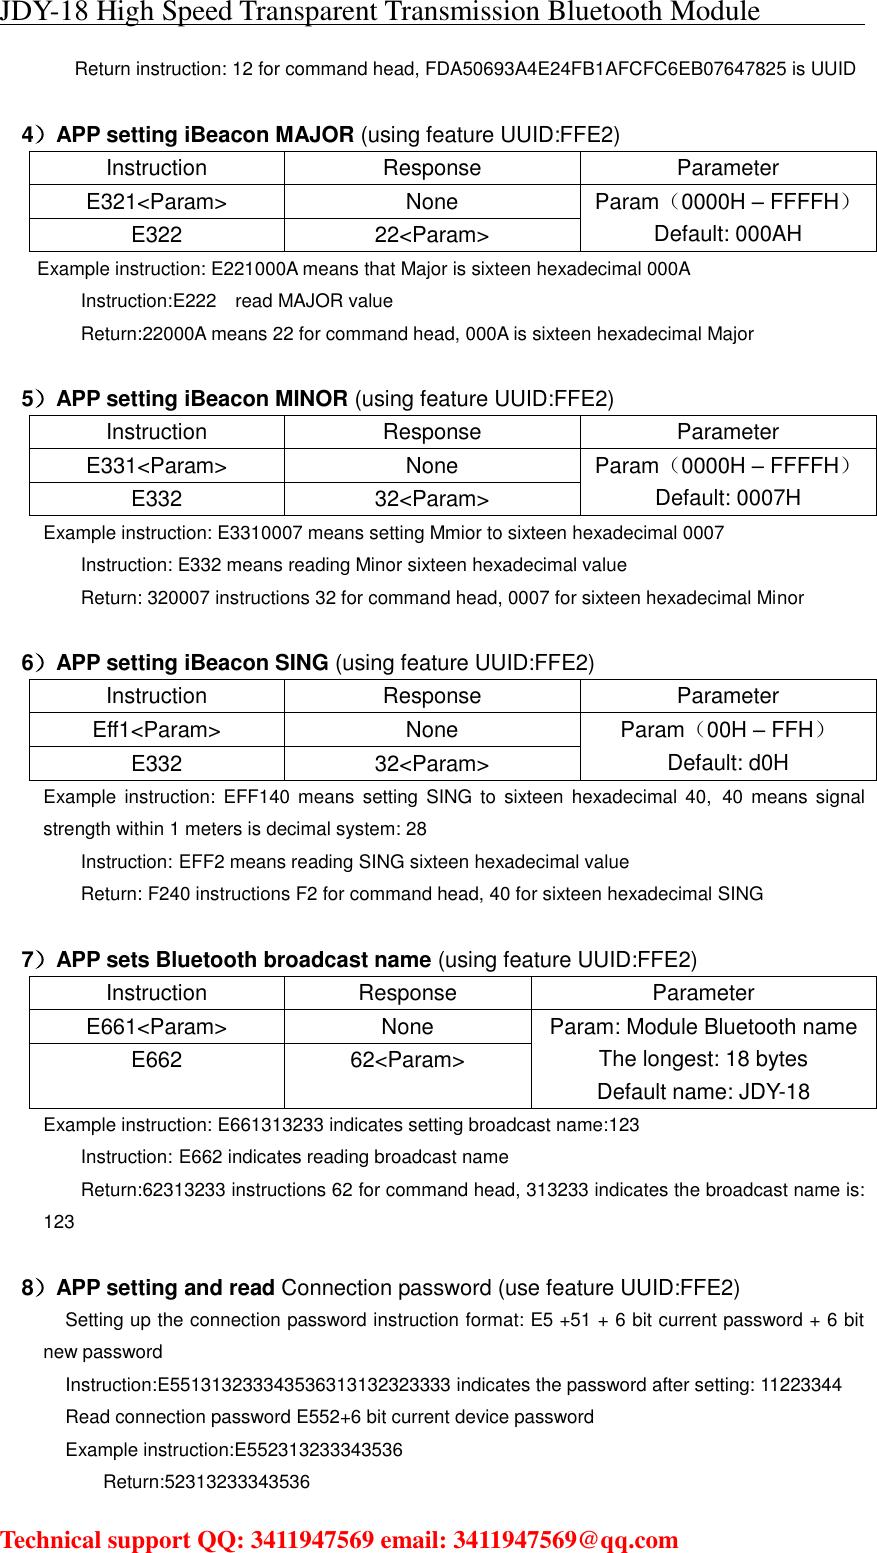 Innovation technology JDY-18 Bluetooth module User Manual